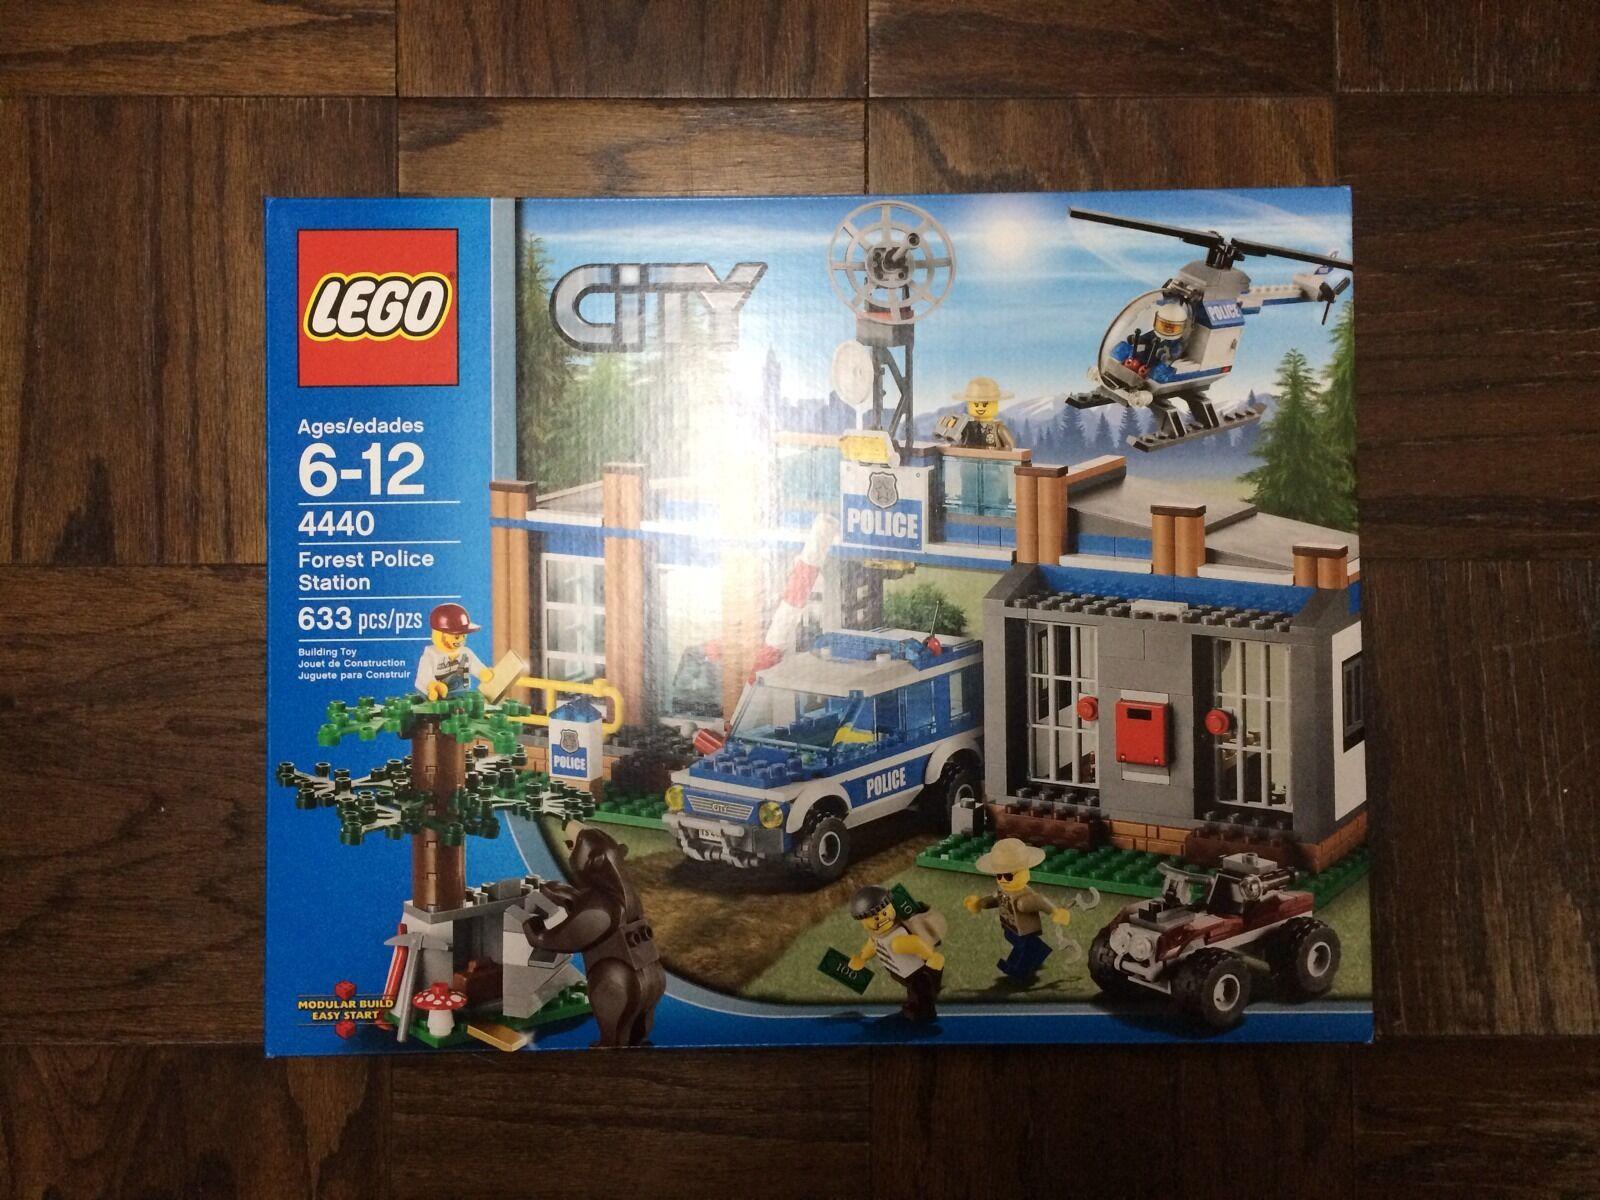 NEUF  LEGO CITY Forest Police Station (4440) - NEUF  bonne réputation